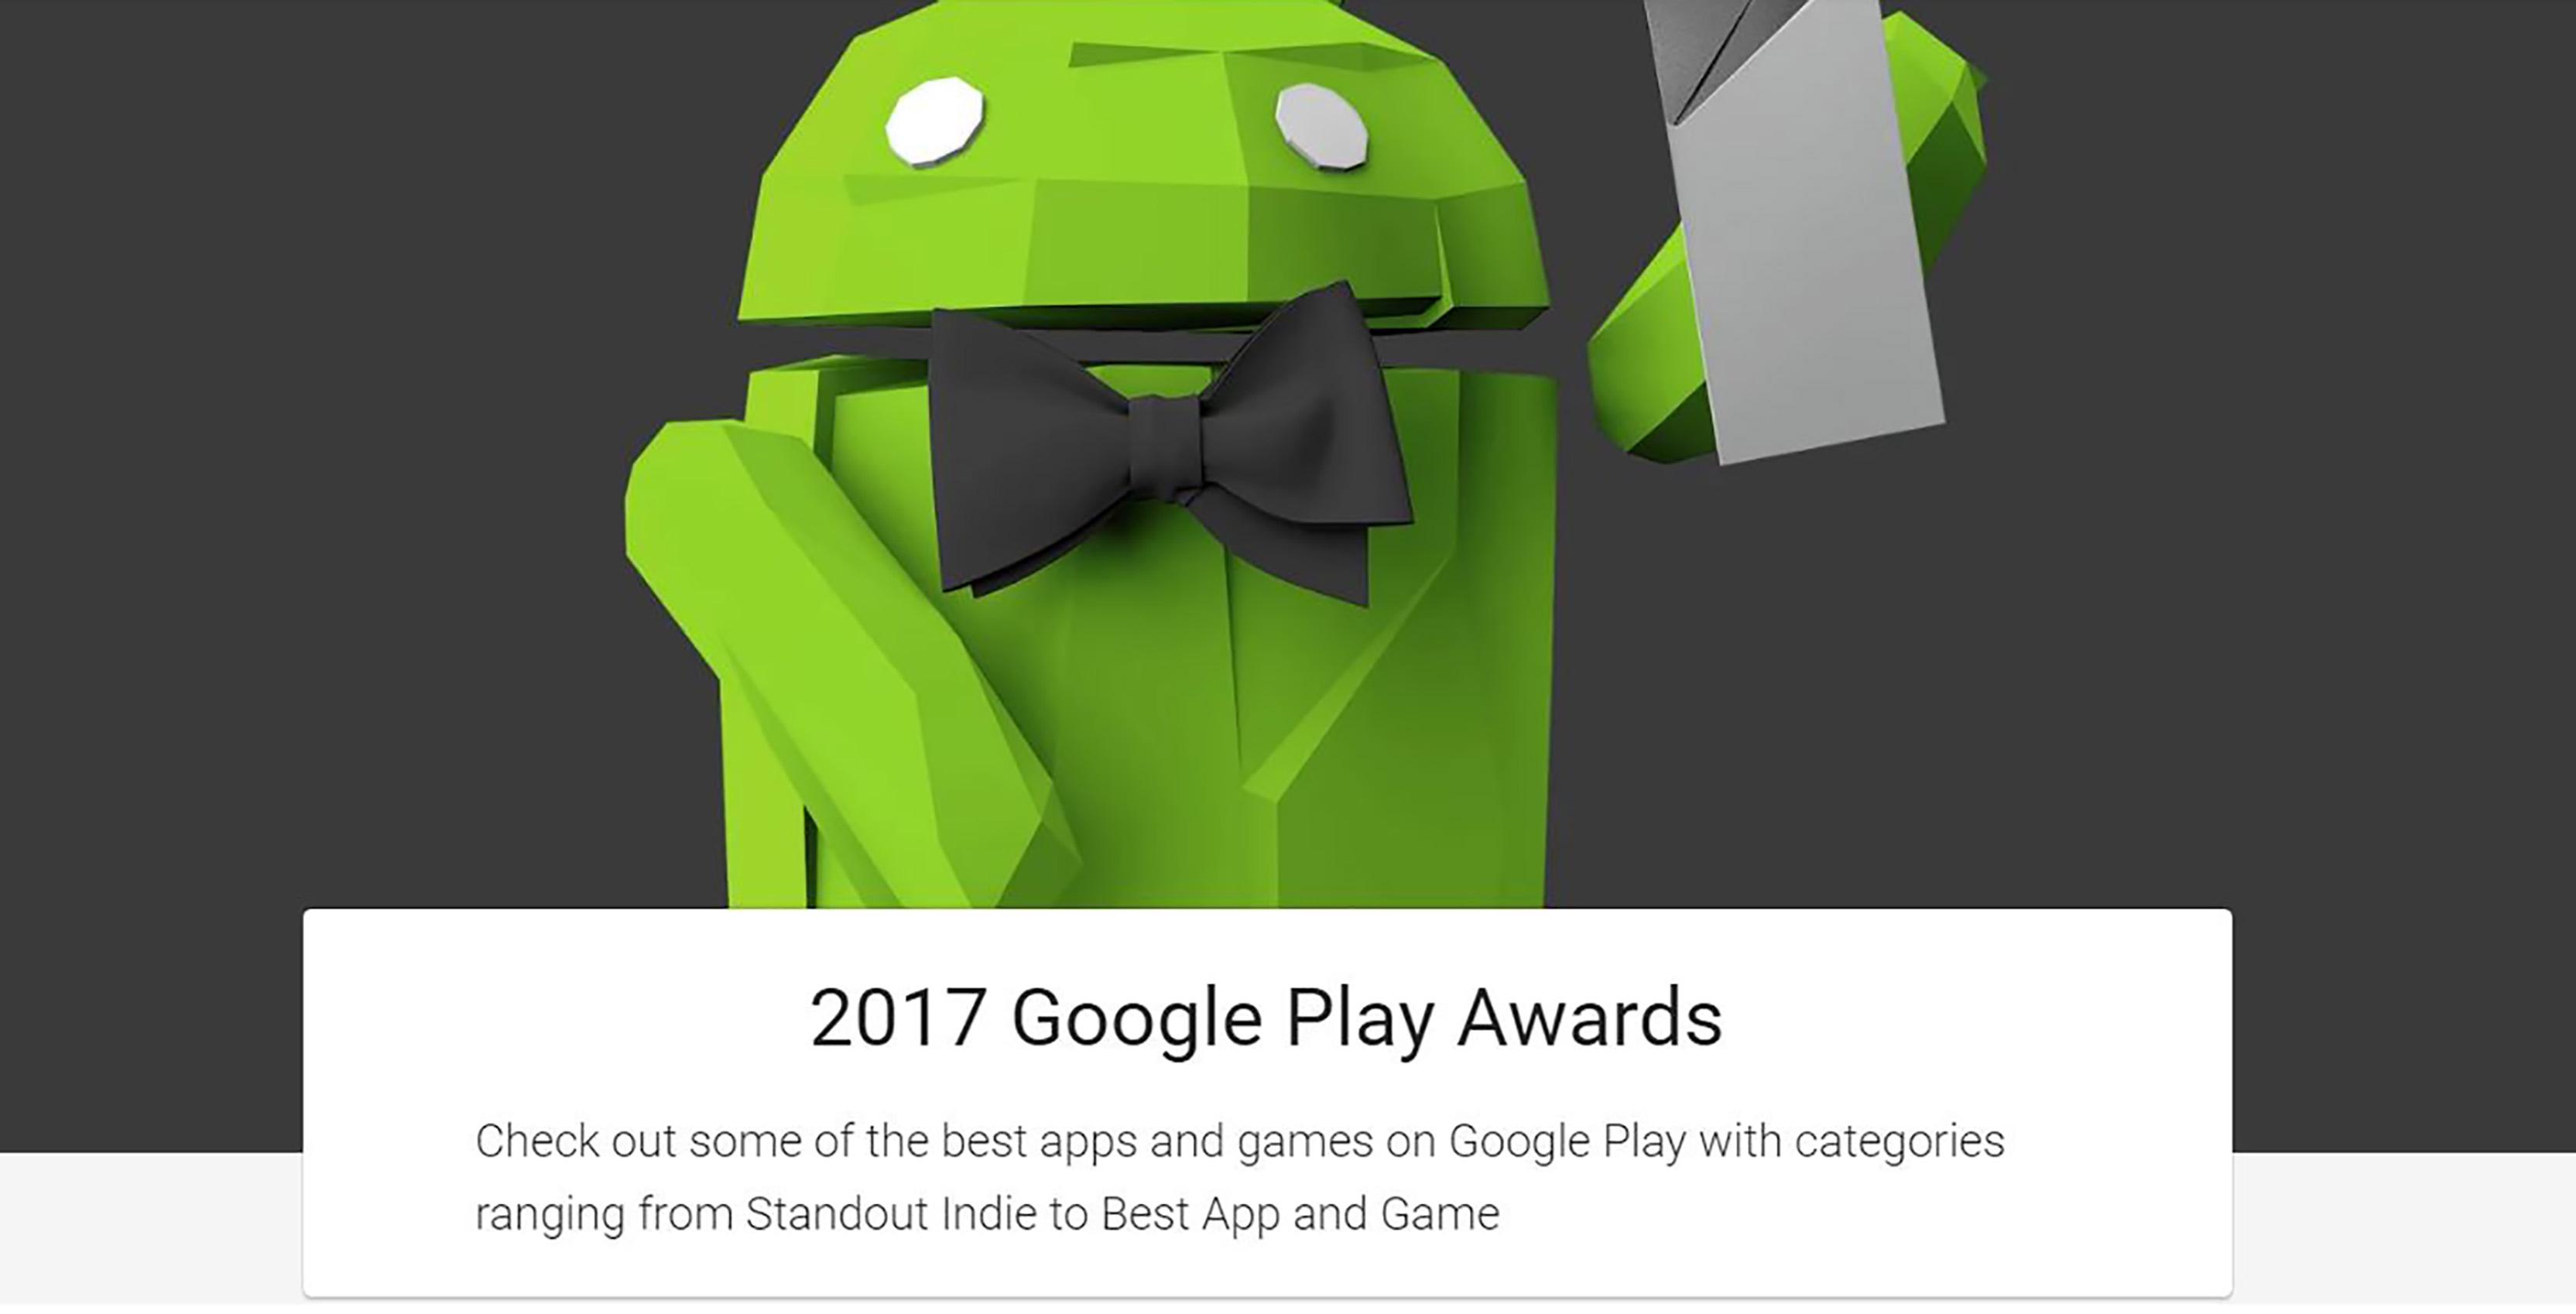 2017 Google Play Award